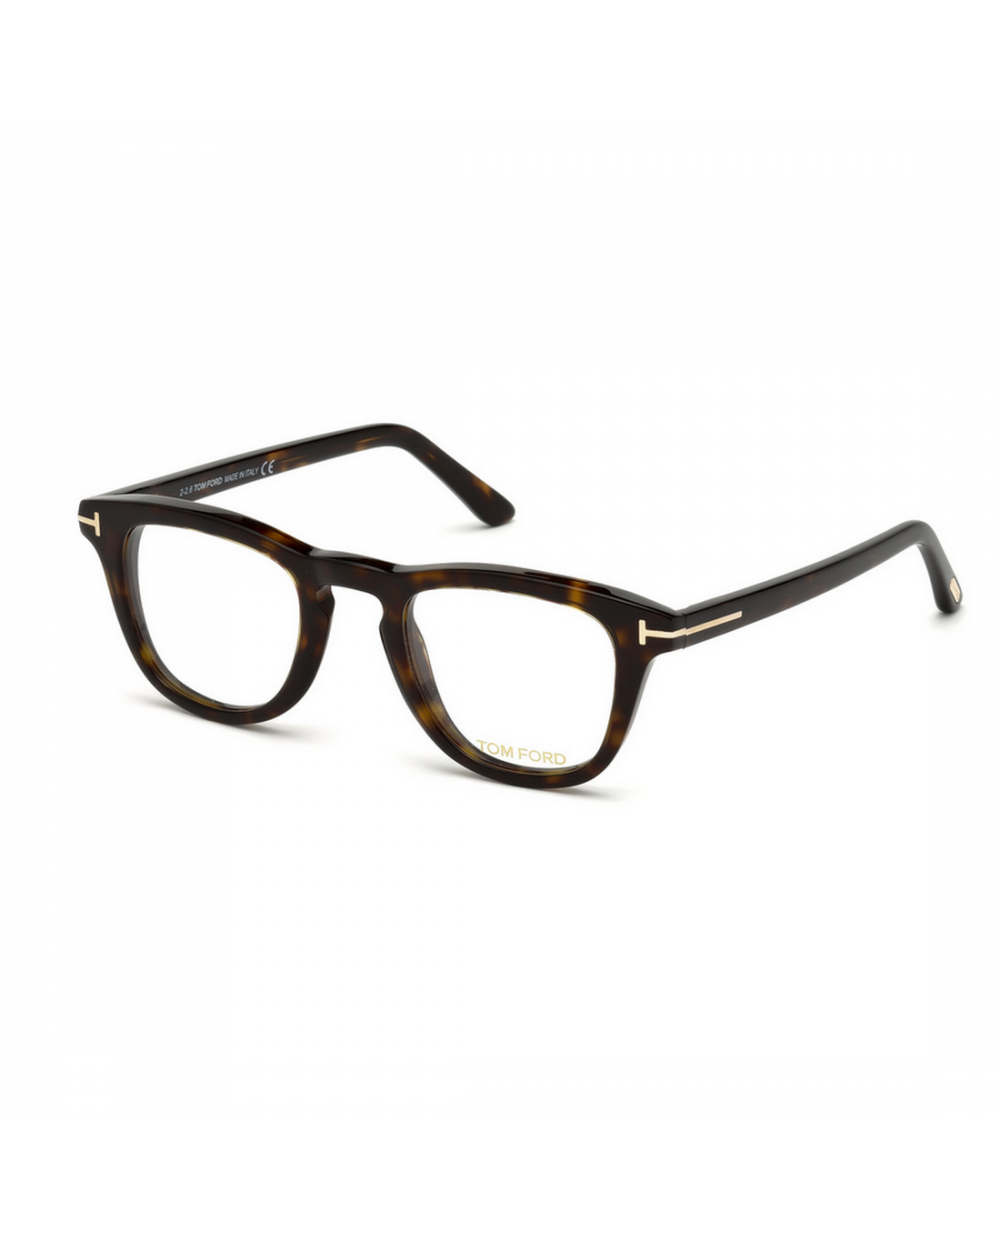 Eyewear eyeglasses Tom Ford FT 5488-B original packaging warranty italy